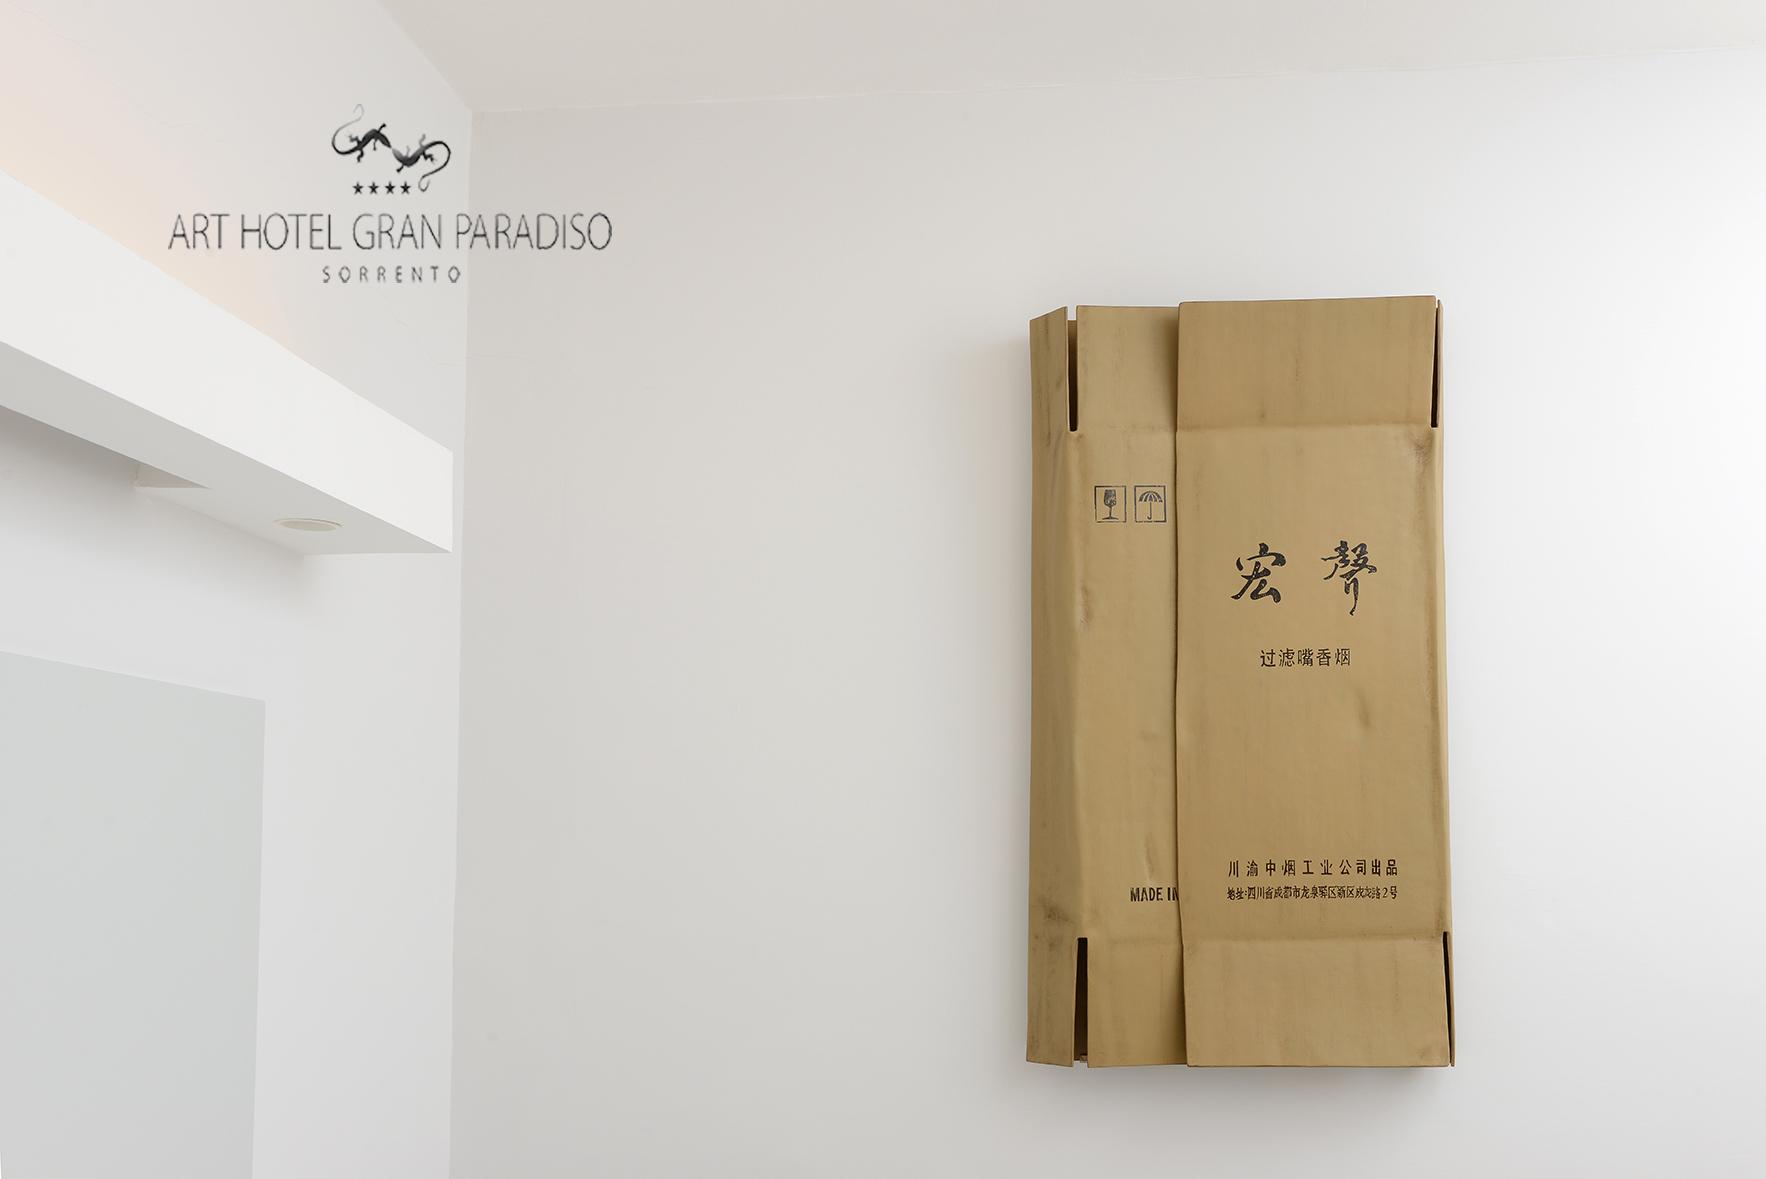 Art_Hotel_Gran_Paradiso_2013_402_Angiolino_Armentano_1.jpg